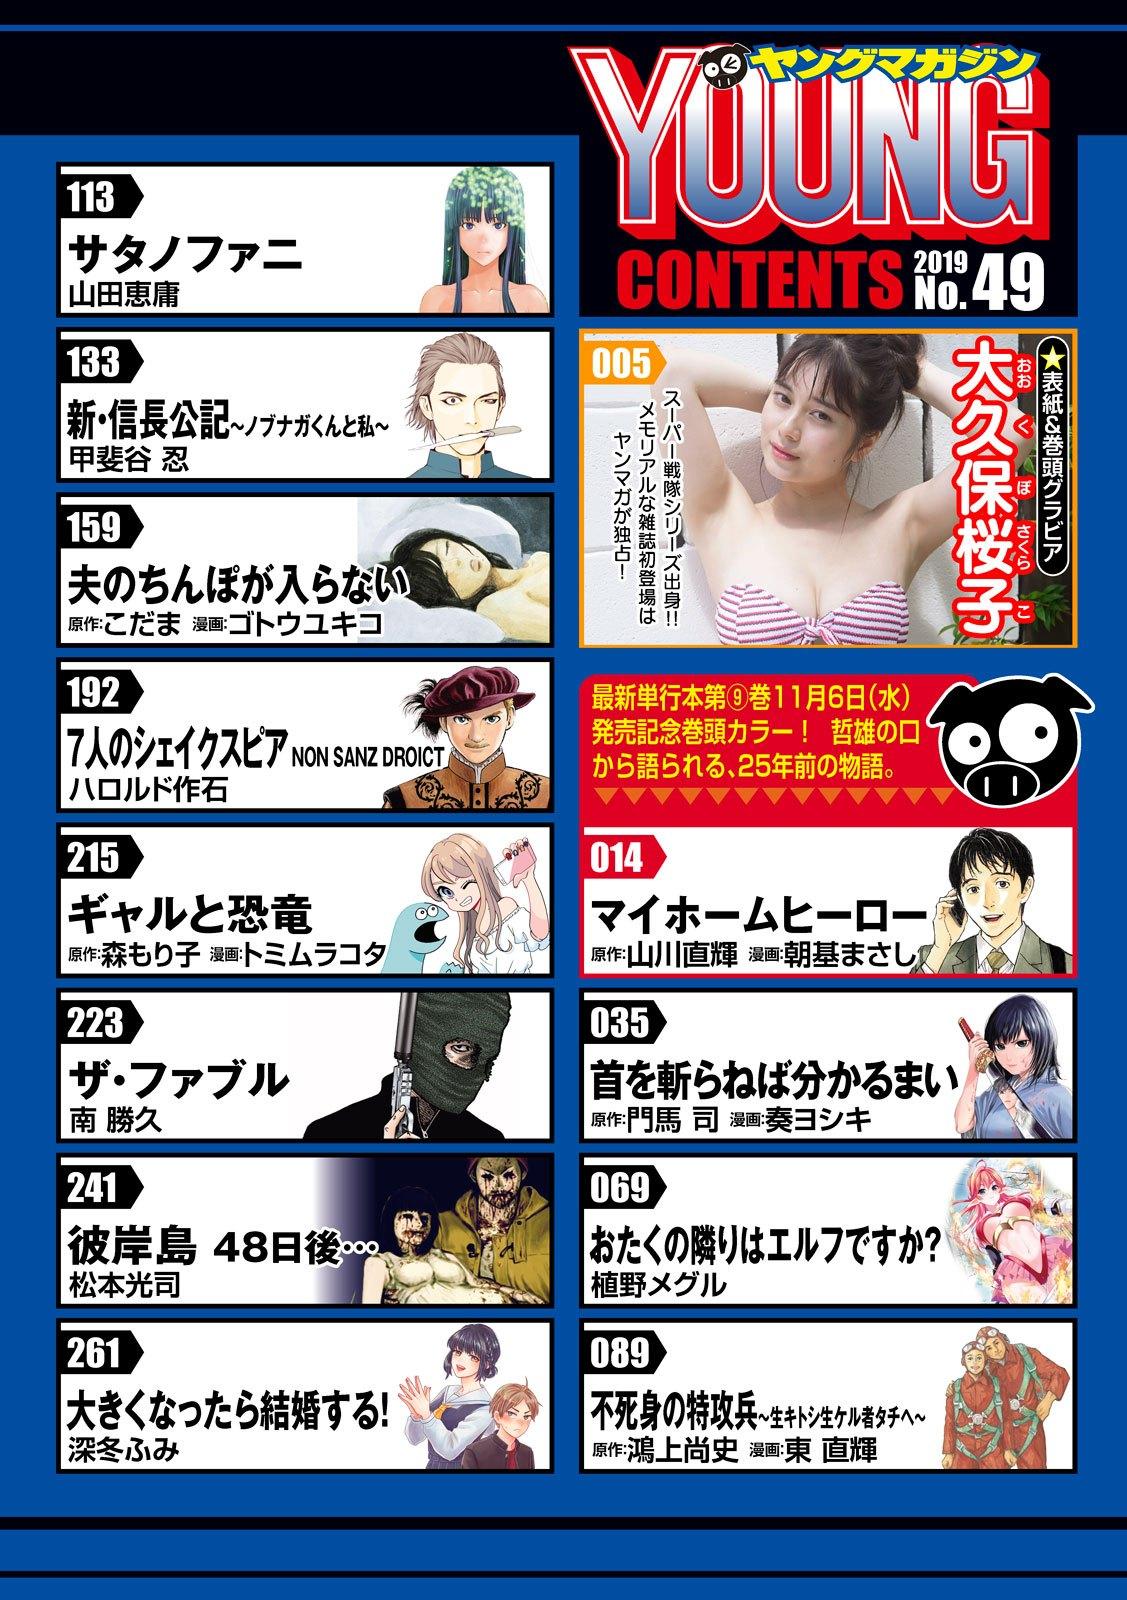 大久保樱子 Young Magazine